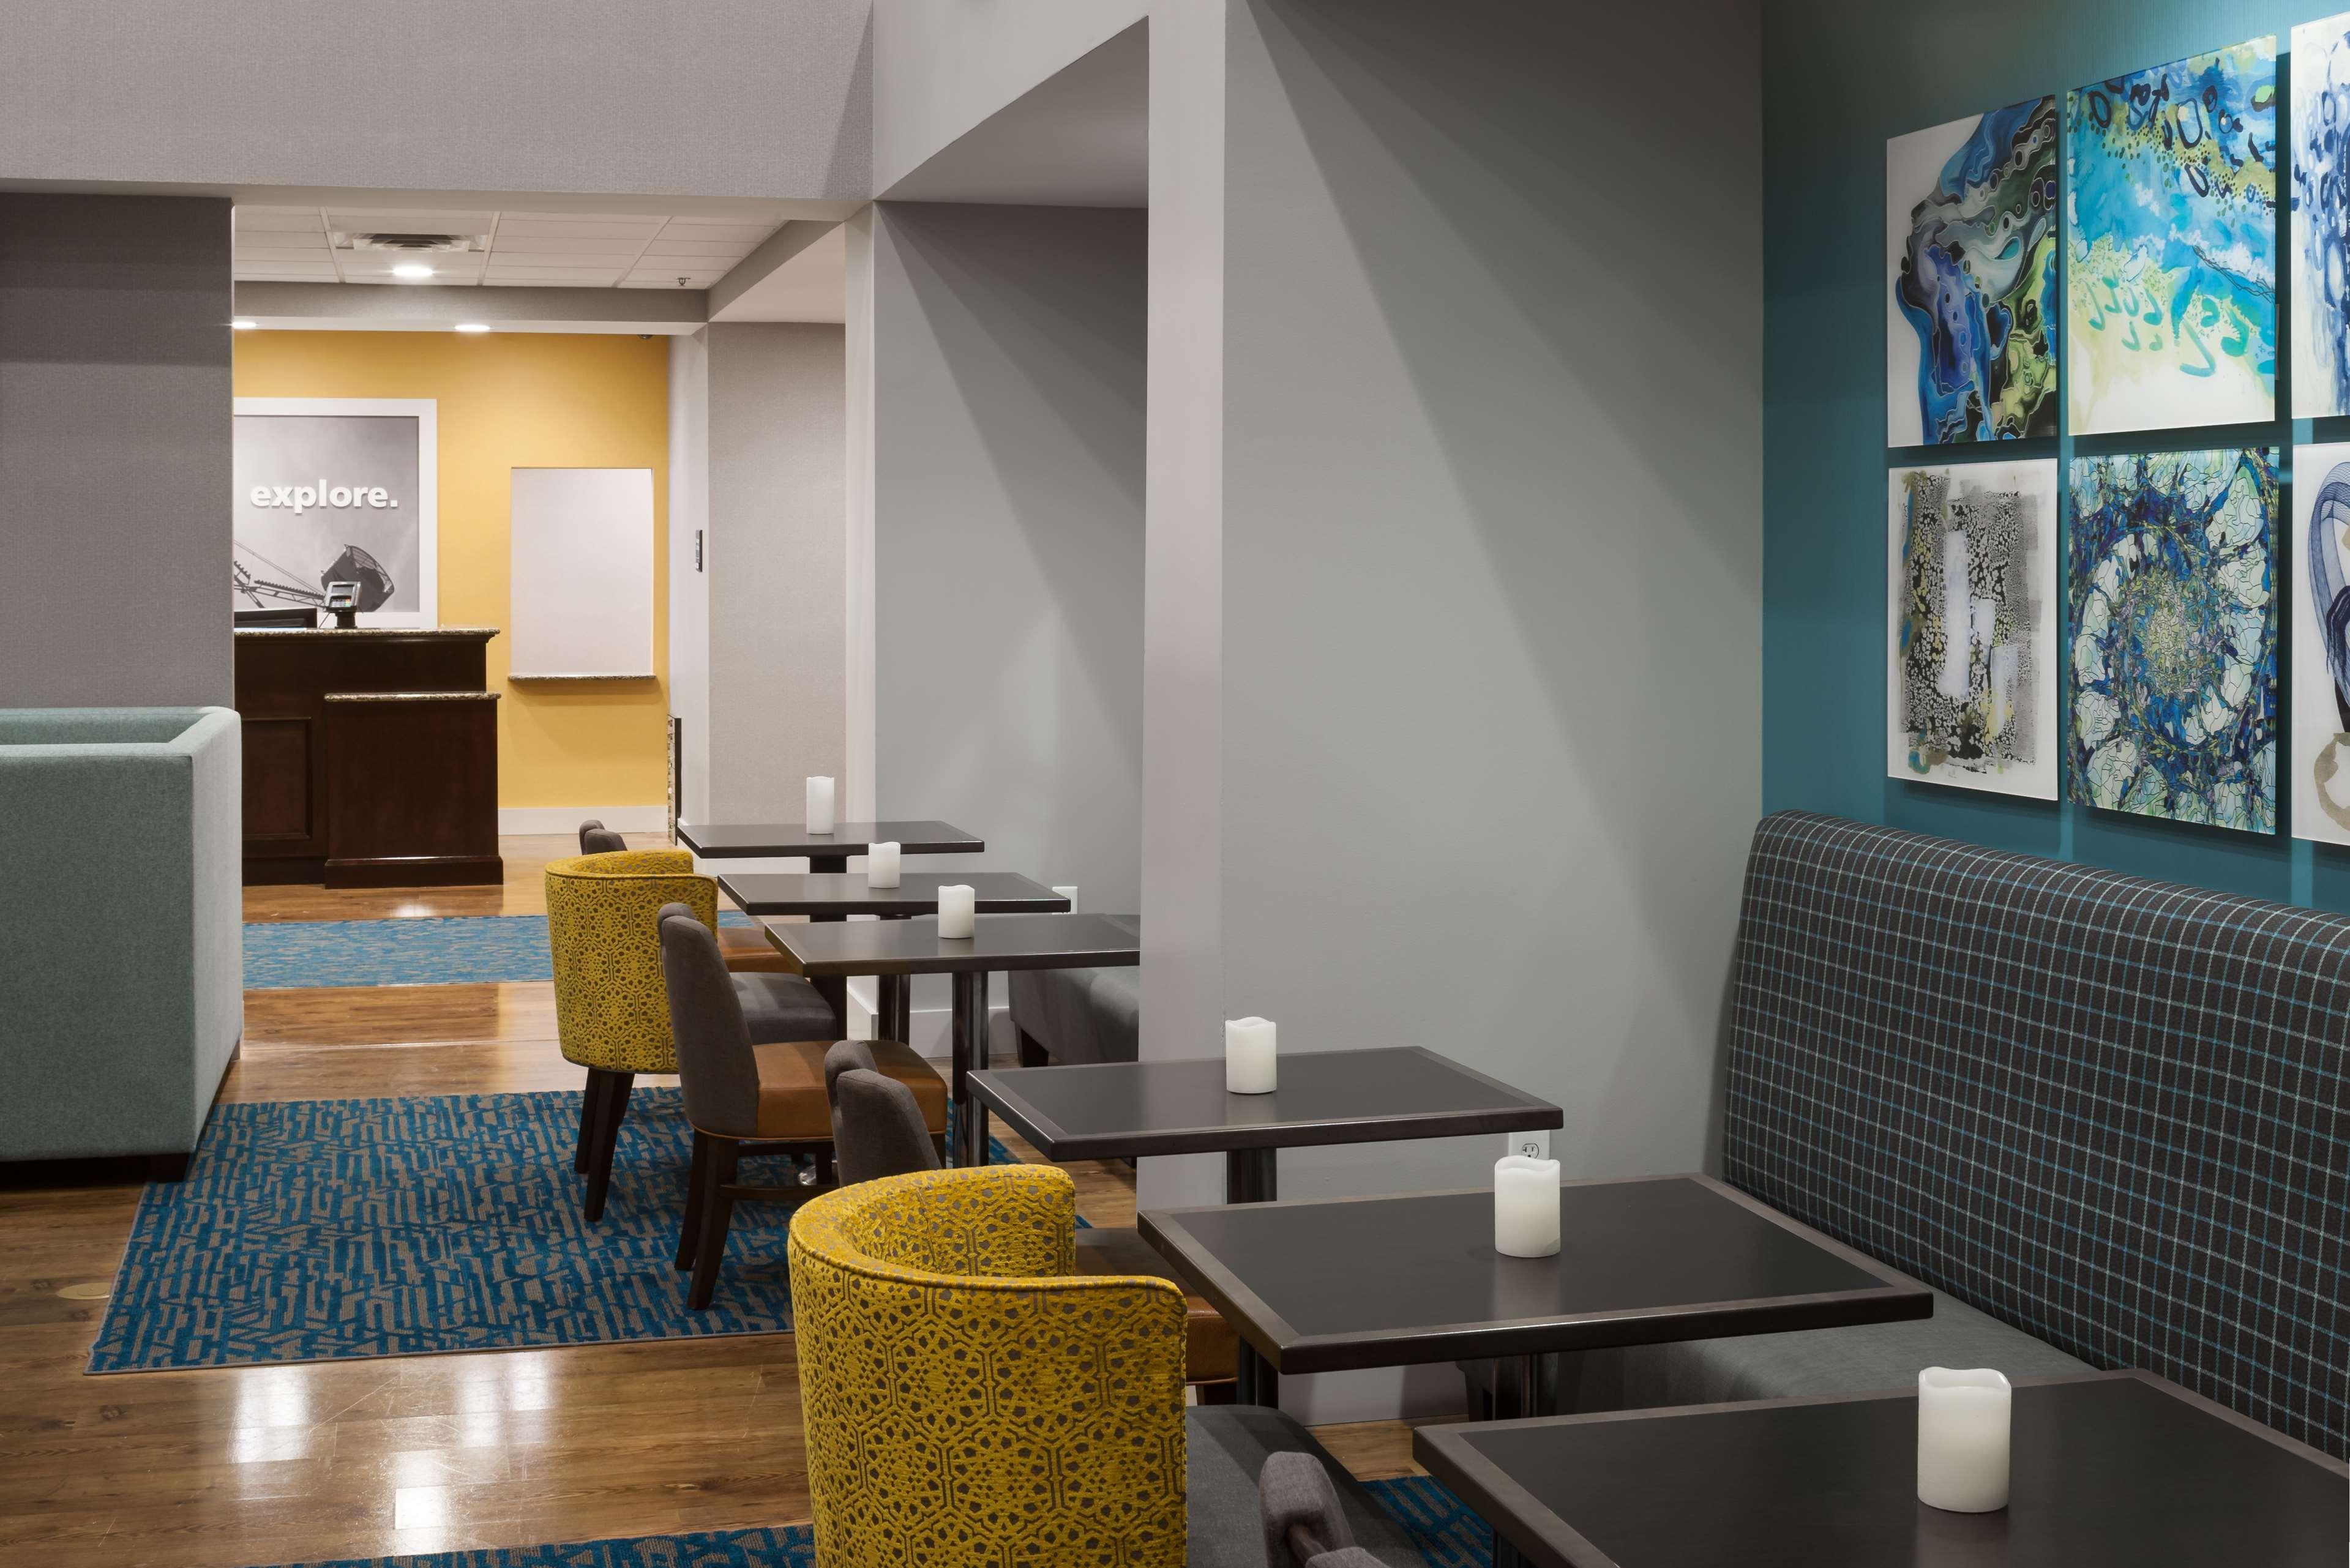 Hampton Inn & Suites Panama City Beach-Pier Park Area image 7